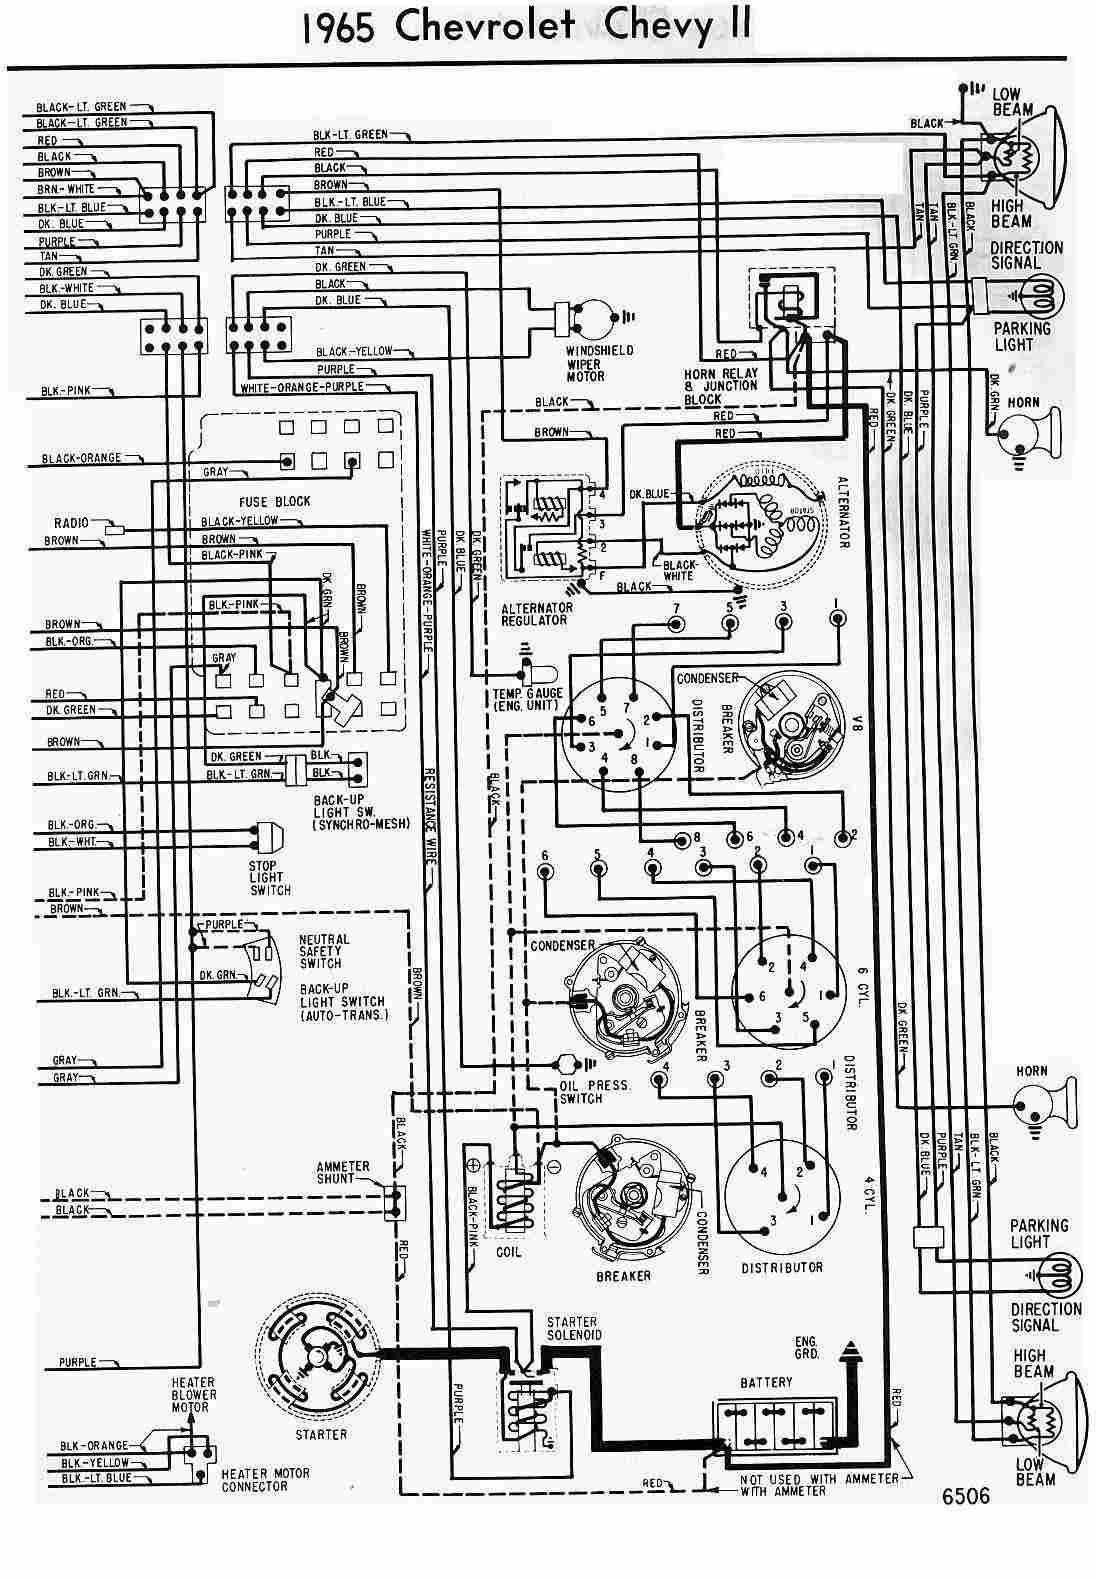 medium resolution of 2003 chevy impala heater schematic simple wiring post rh 37 asiagourmet igb de 1966 impala wiring diagram 1961 impala wiring diagram